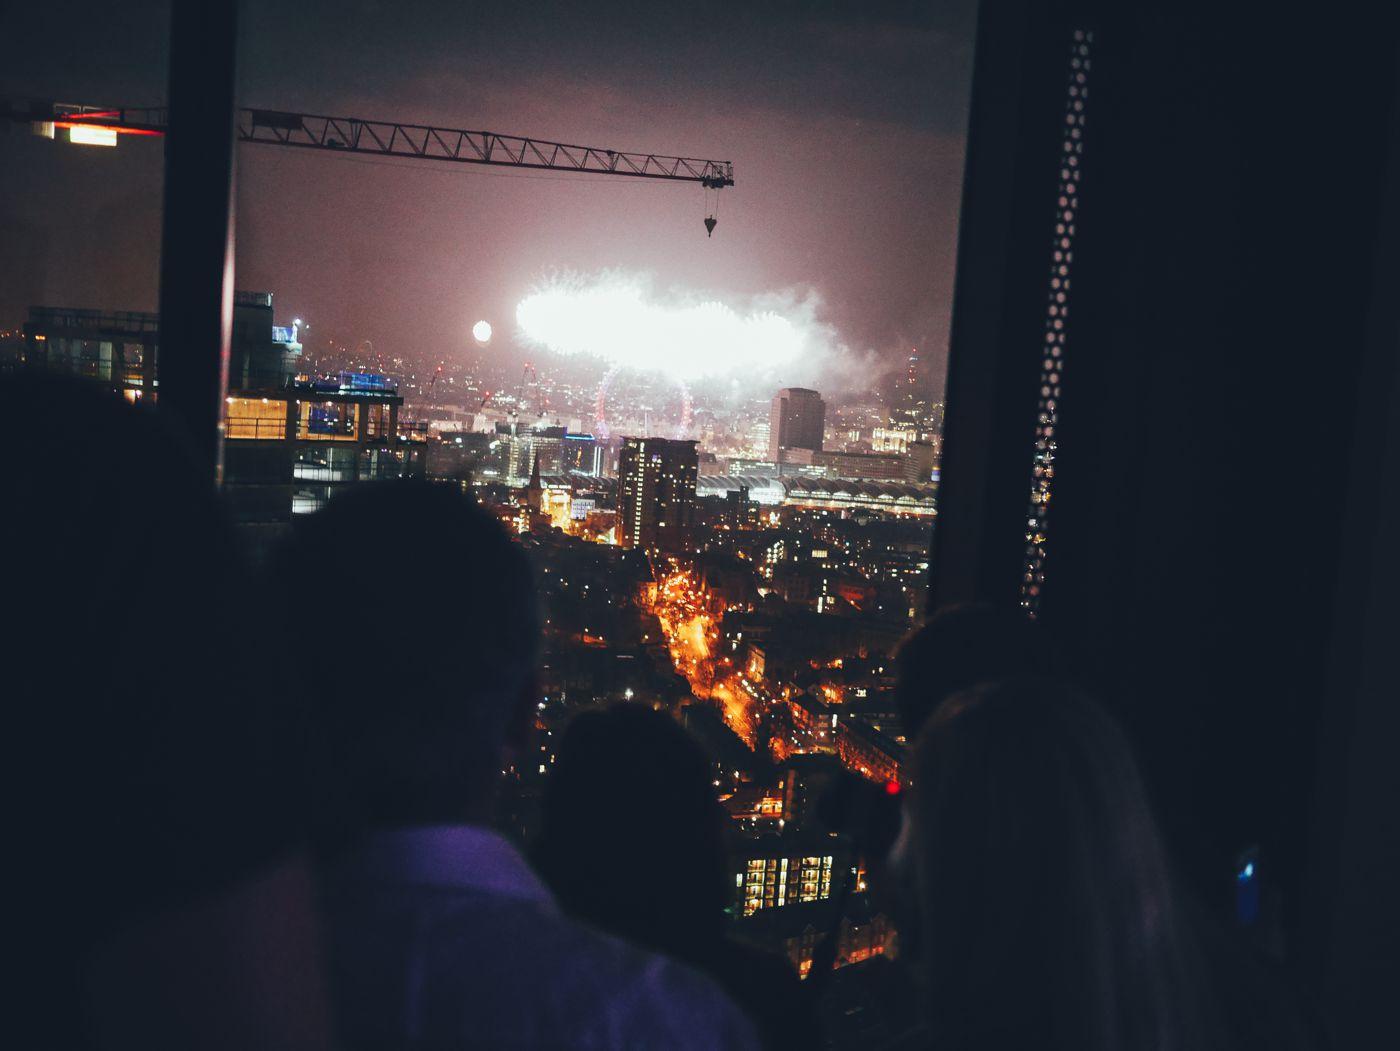 Sneak Peak Of My New Flat + New Year